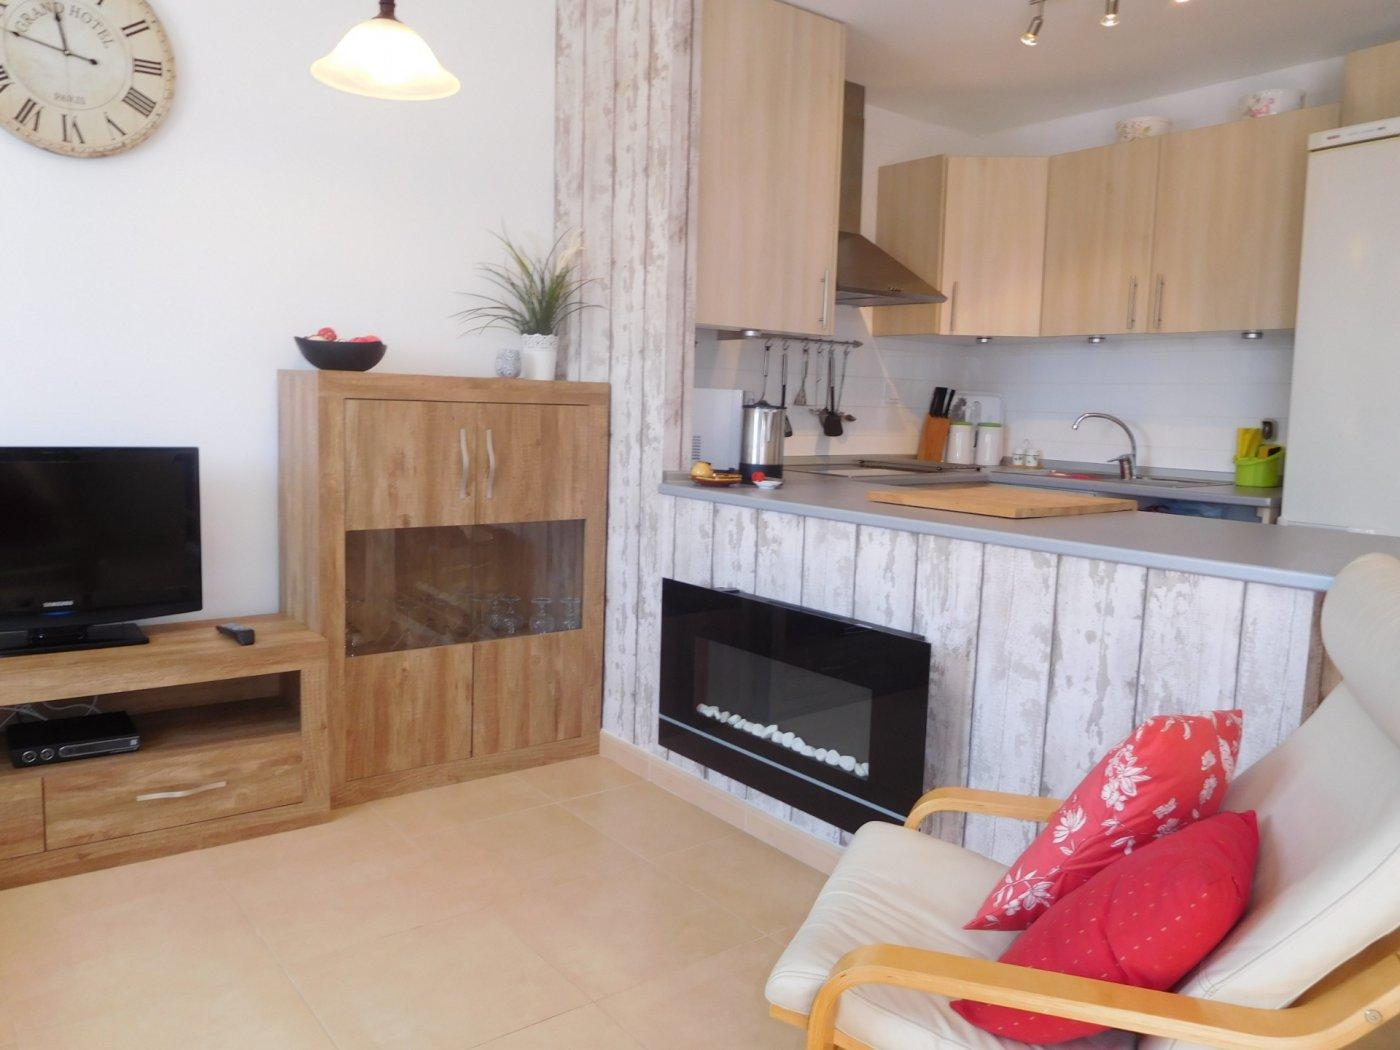 Gallery Image 1 of Apartment For rent in Condado De Alhama, Alhama De Murcia With Pool